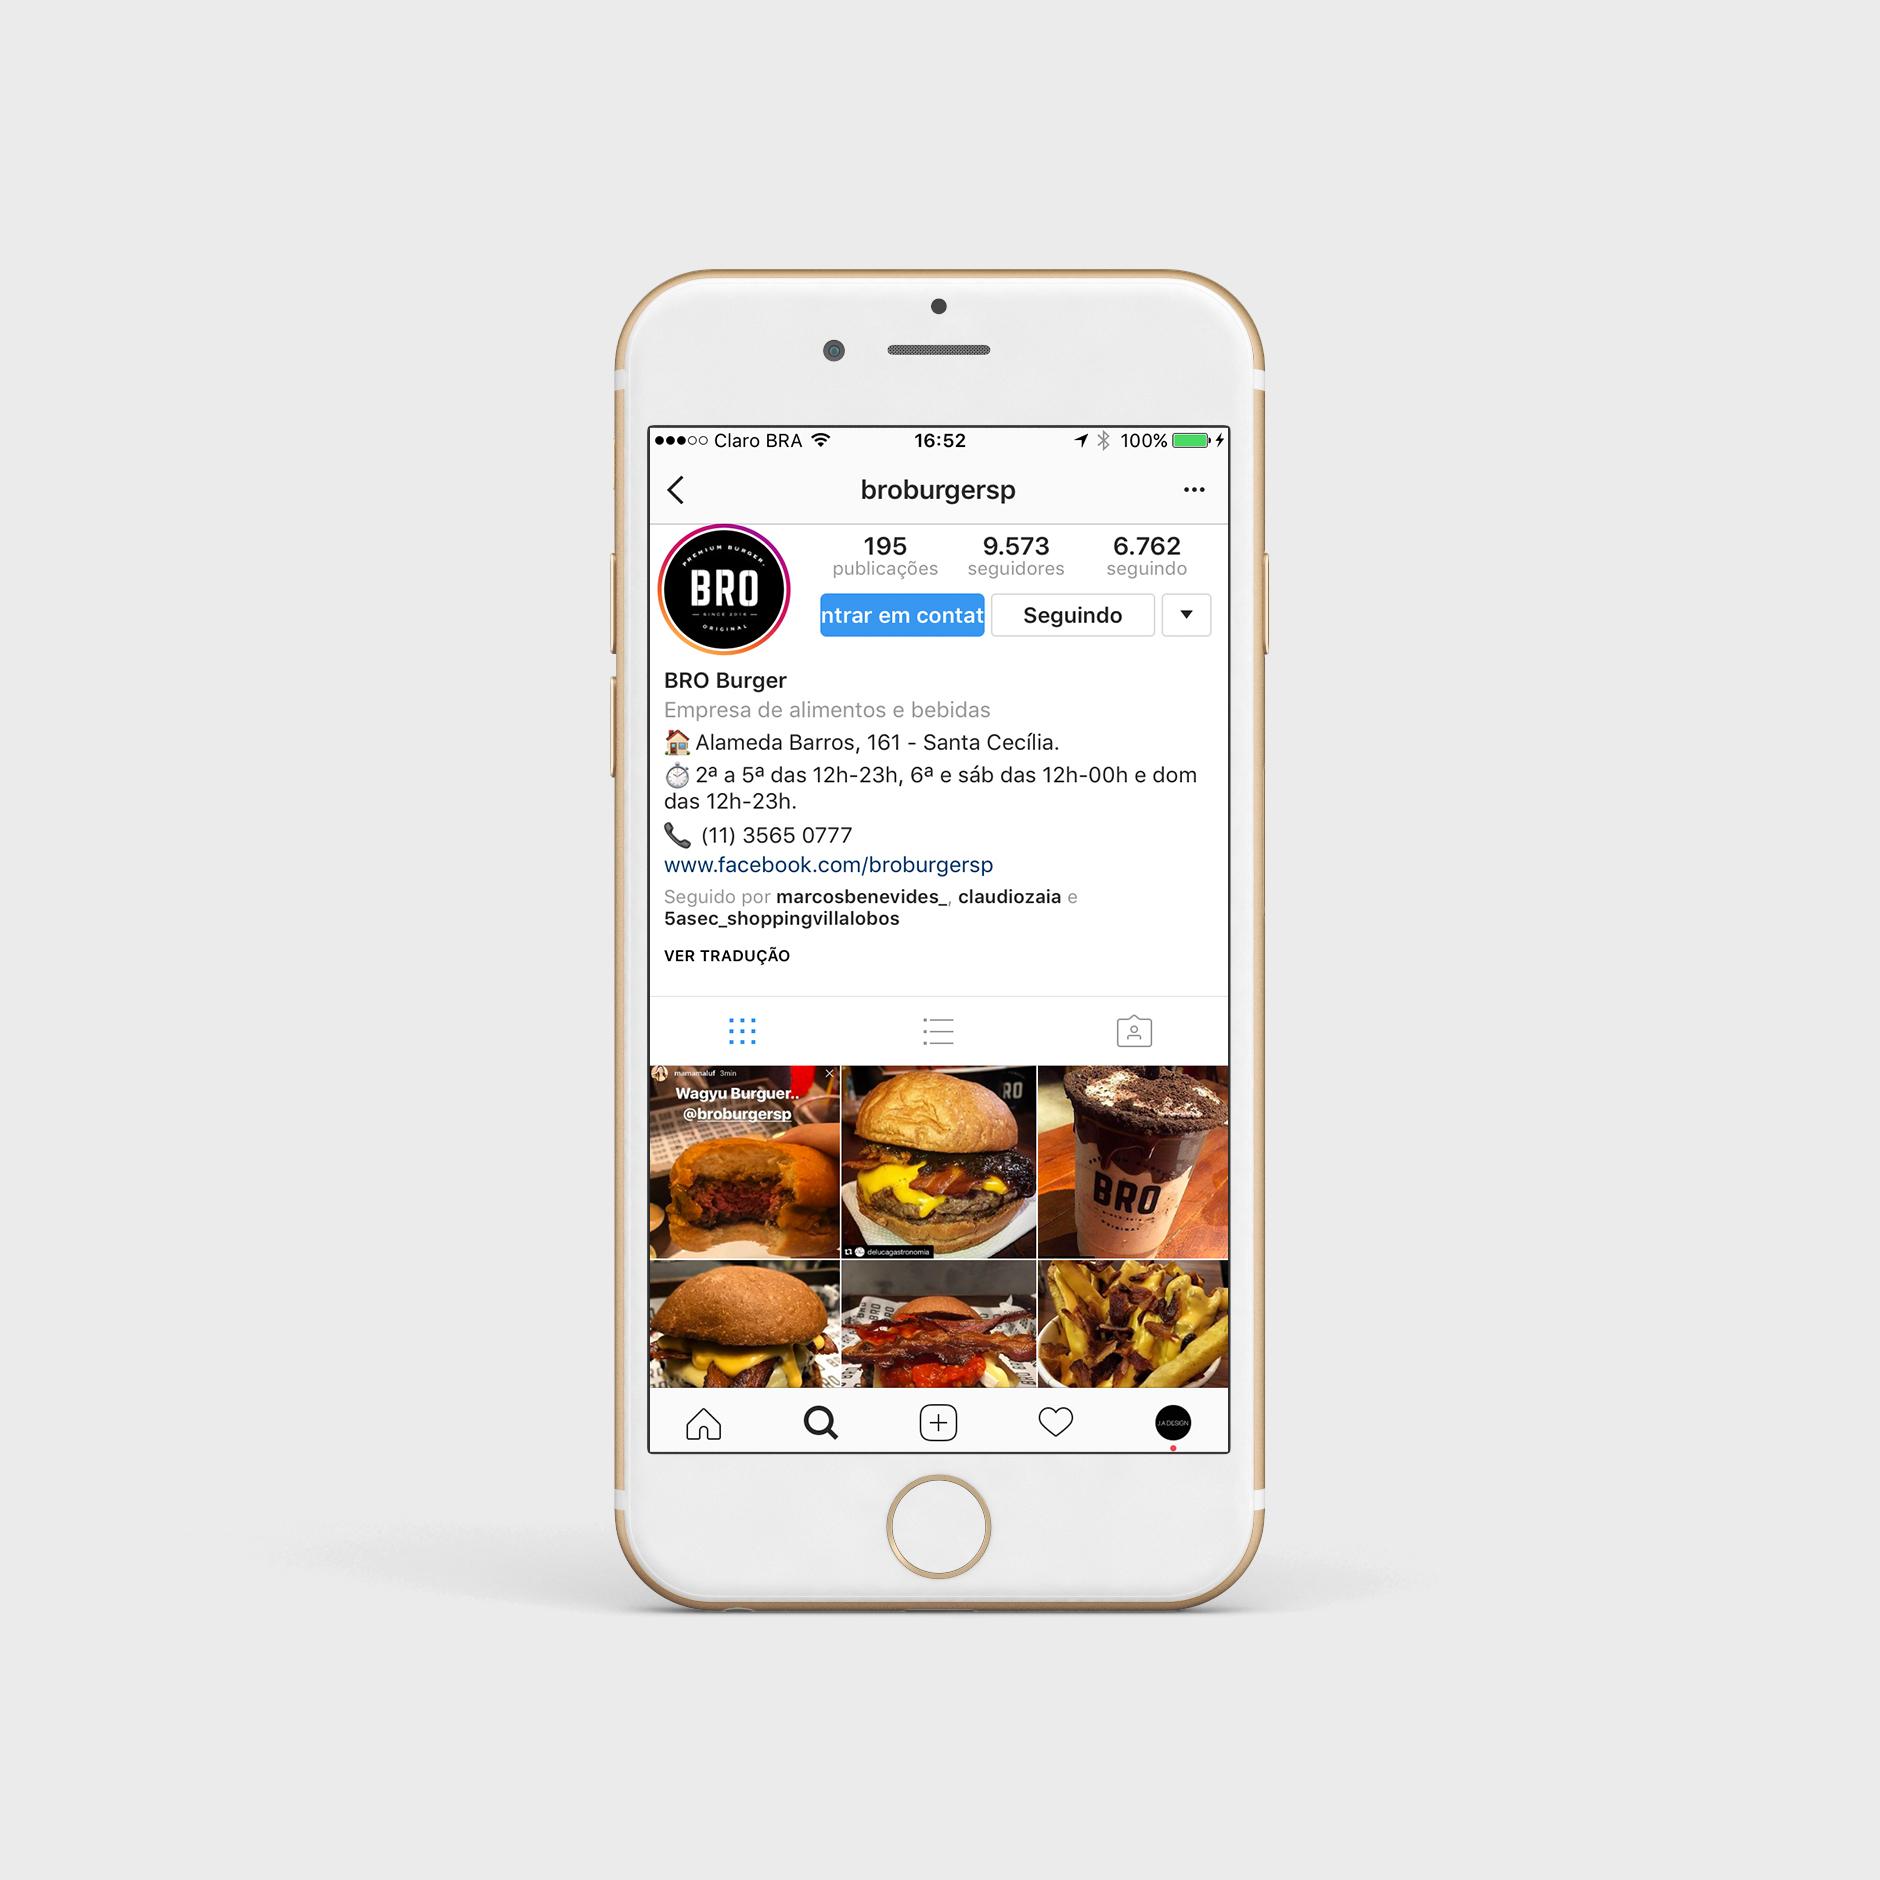 Instagram Bro Burger